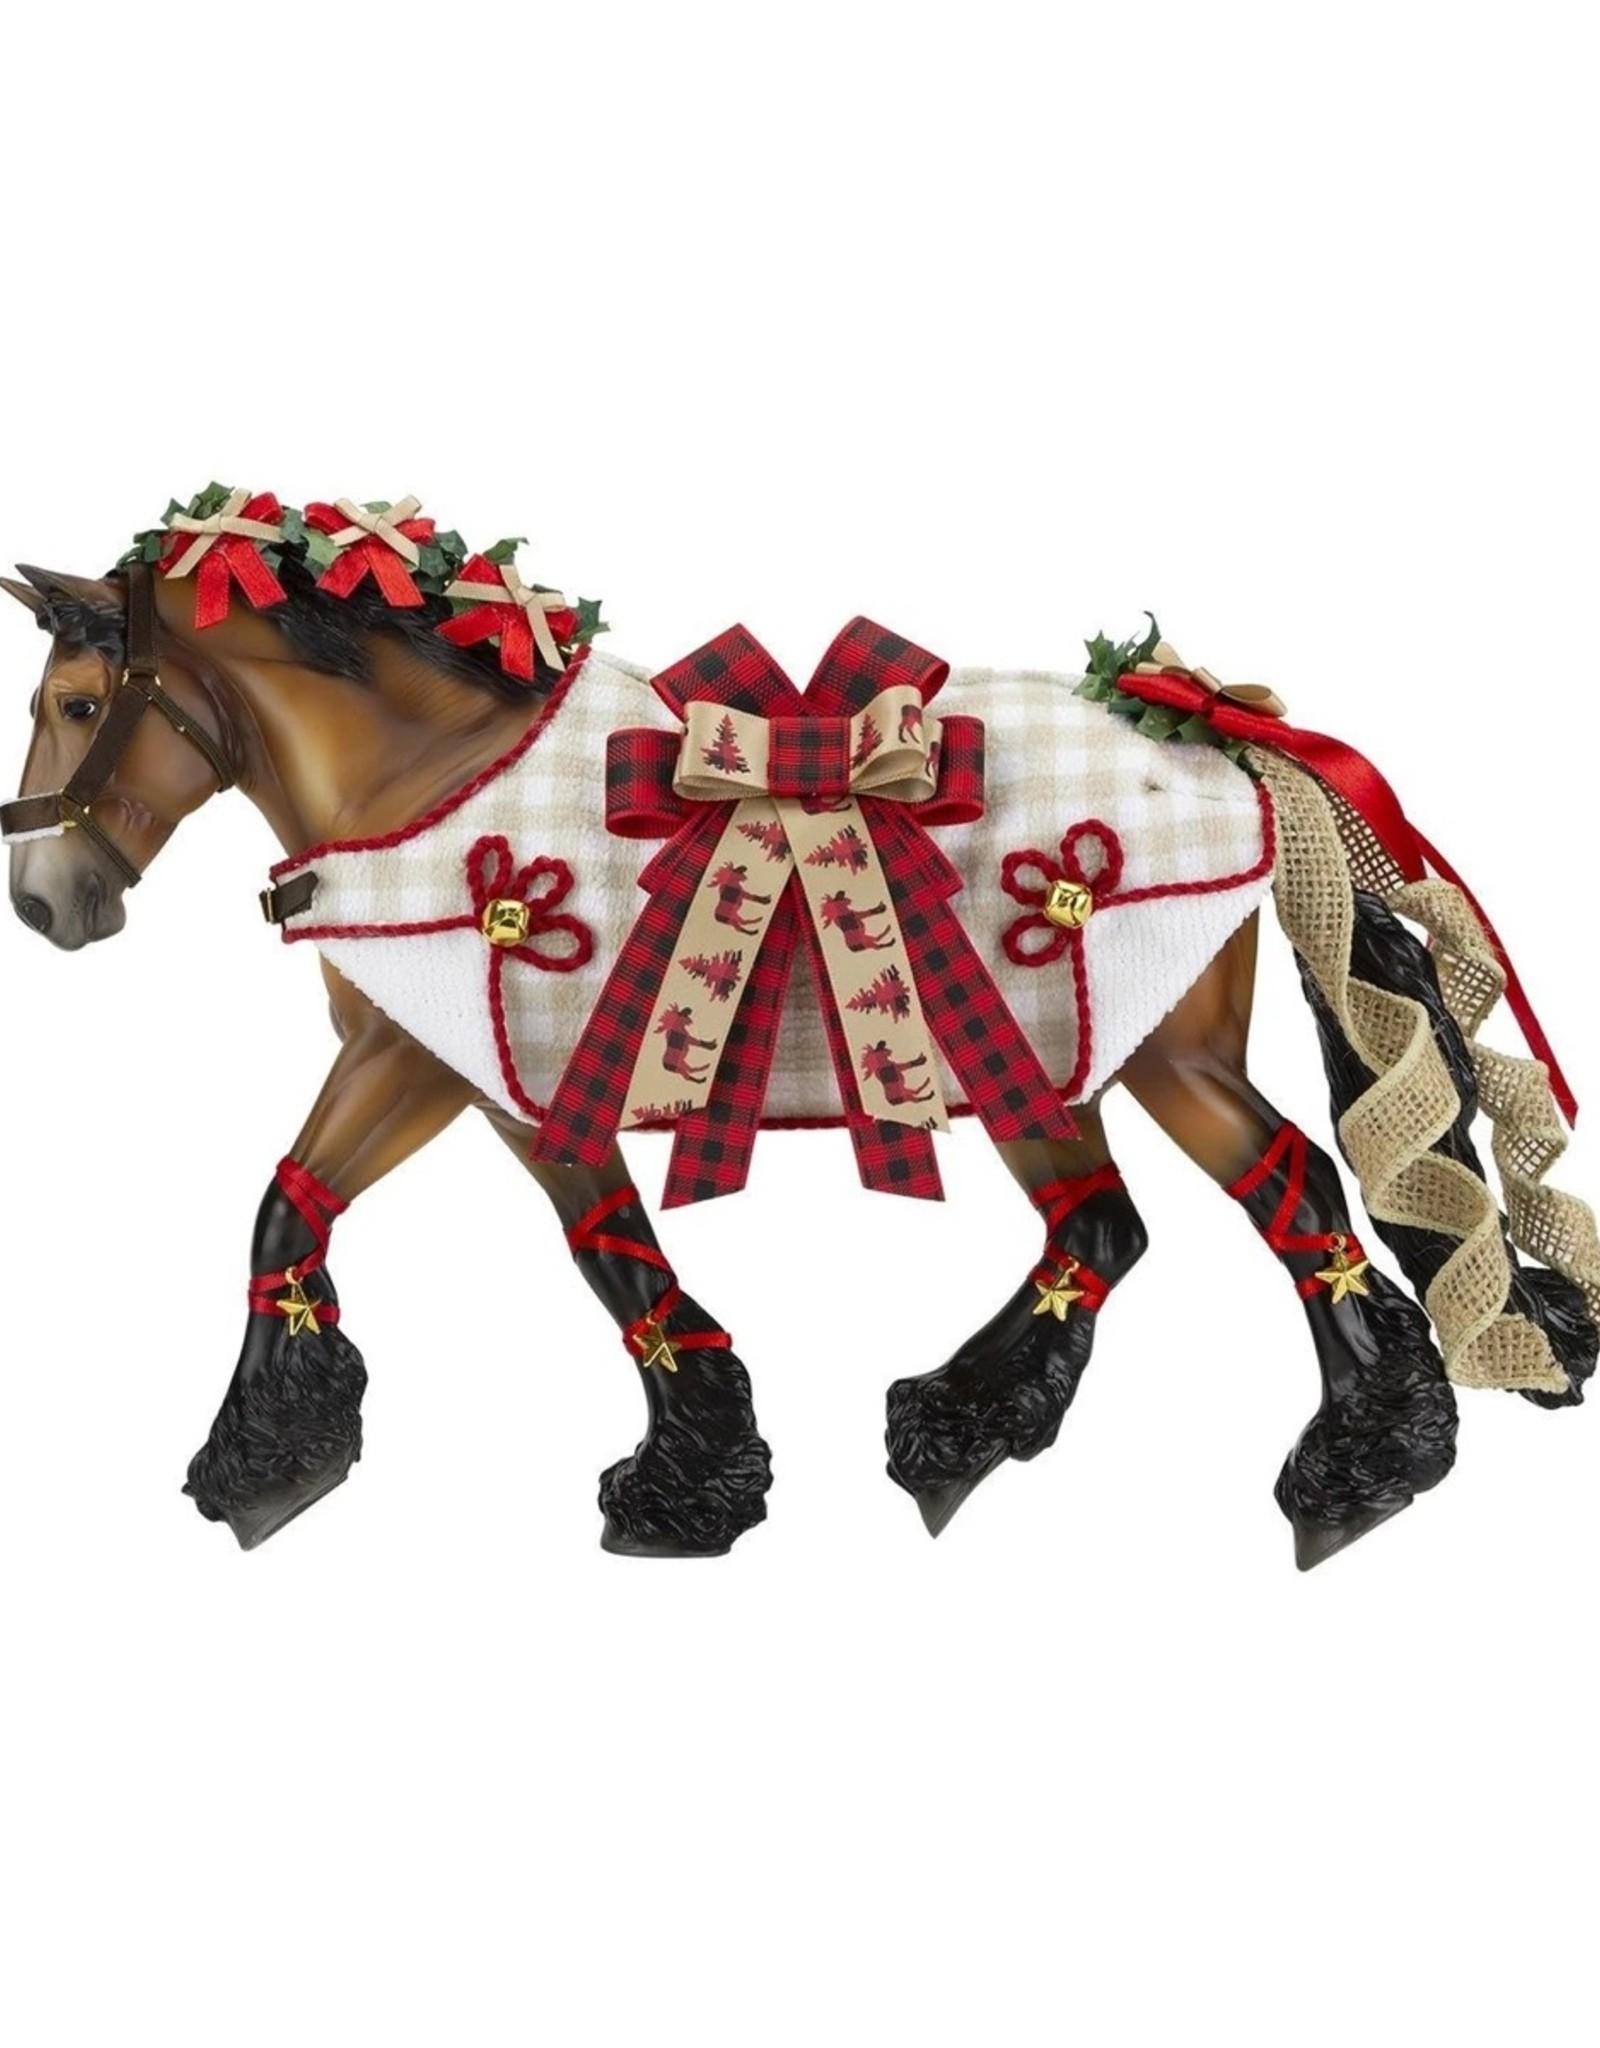 Breyer Yuletide Greetings 2020 Holiday Horse